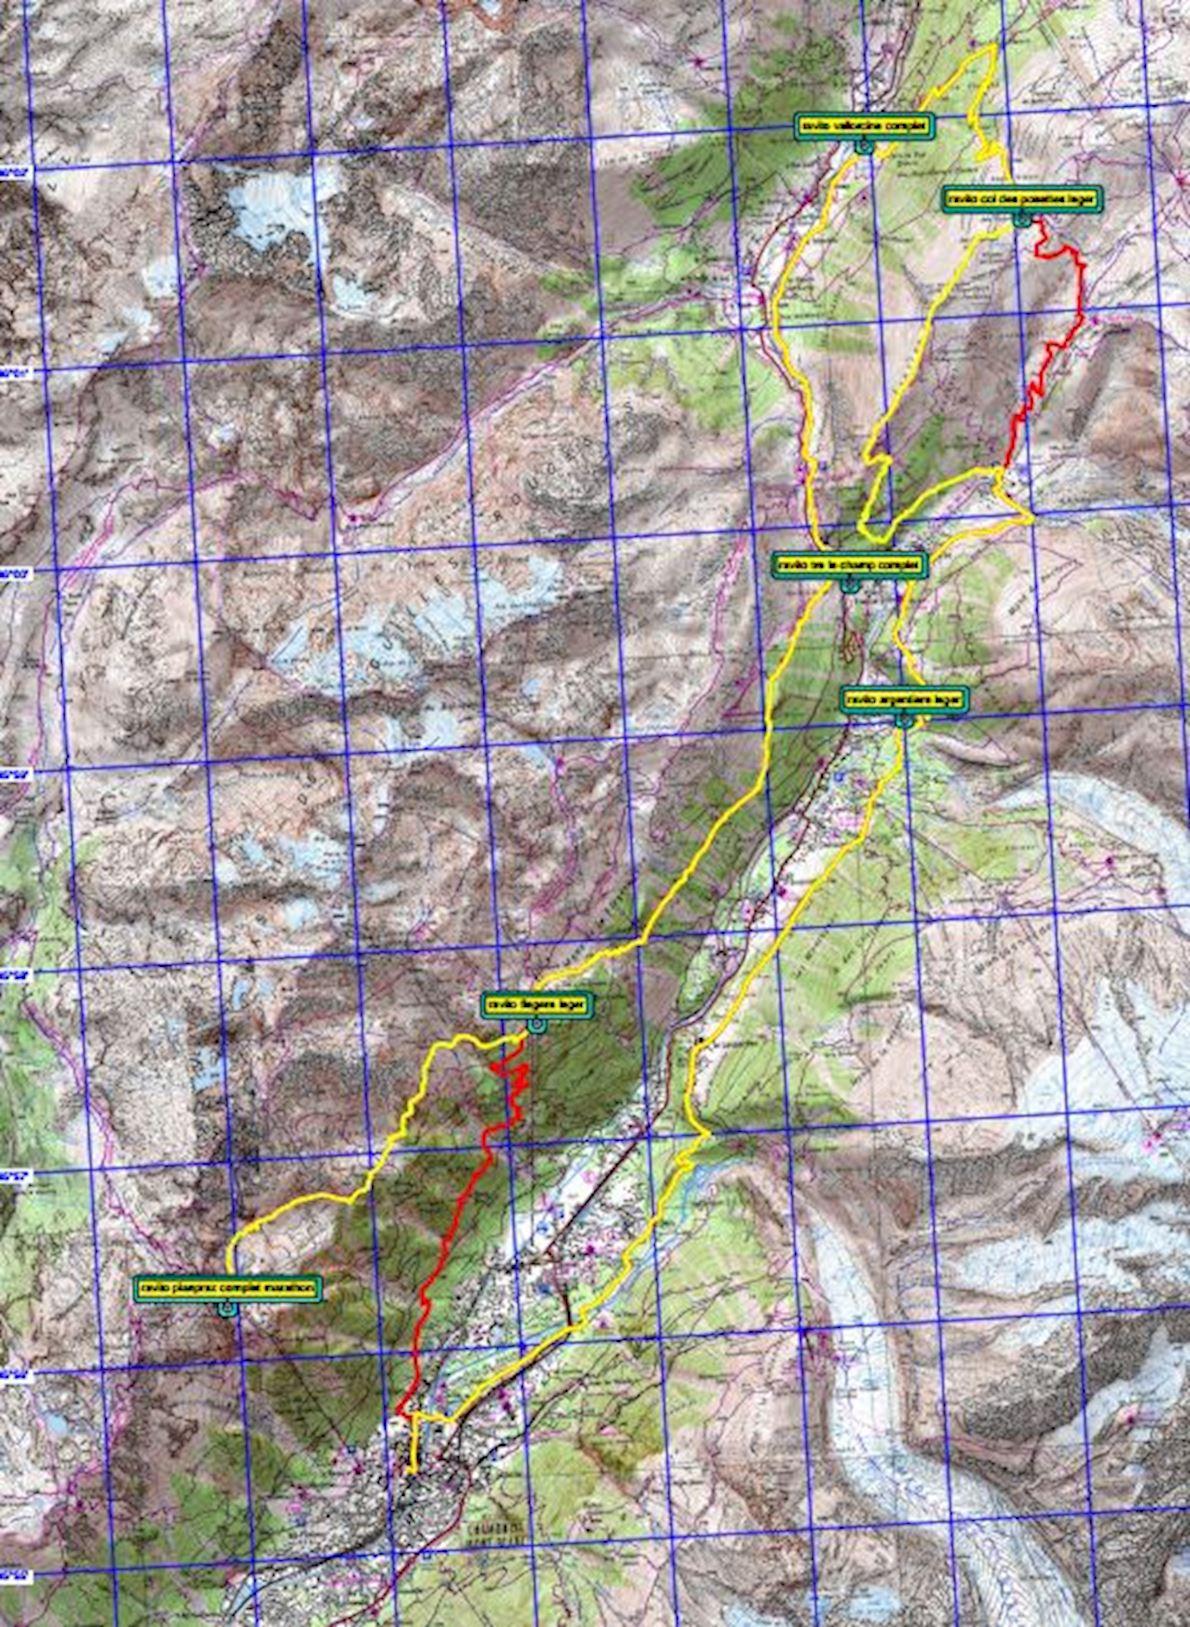 Marathon du Mont-Blanc MAPA DEL RECORRIDO DE